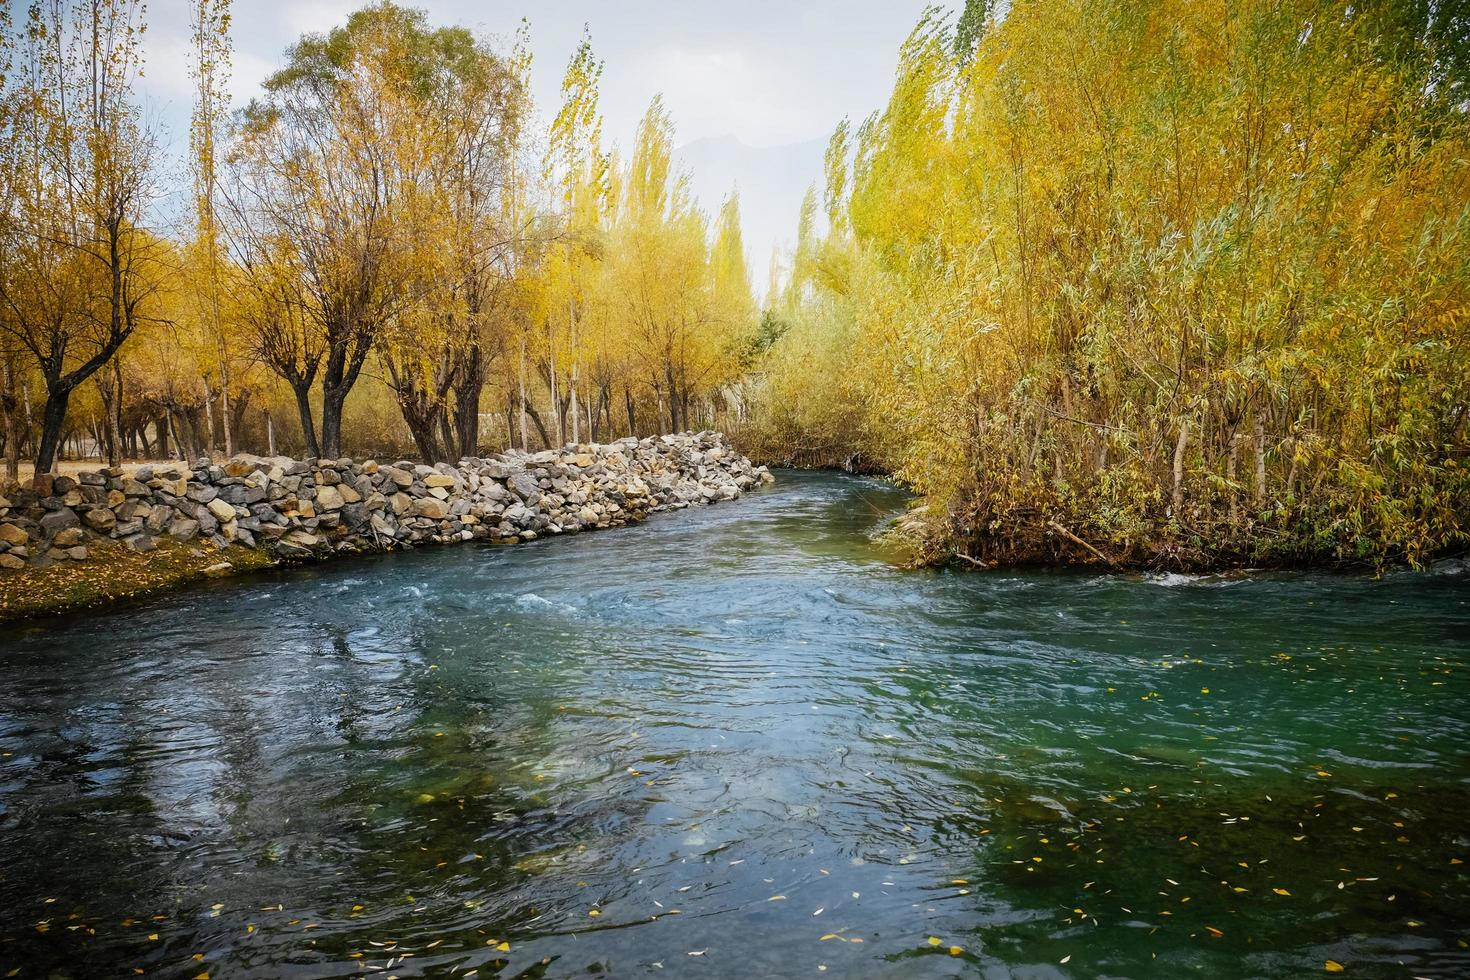 Creek flowing through colorful foliage photo